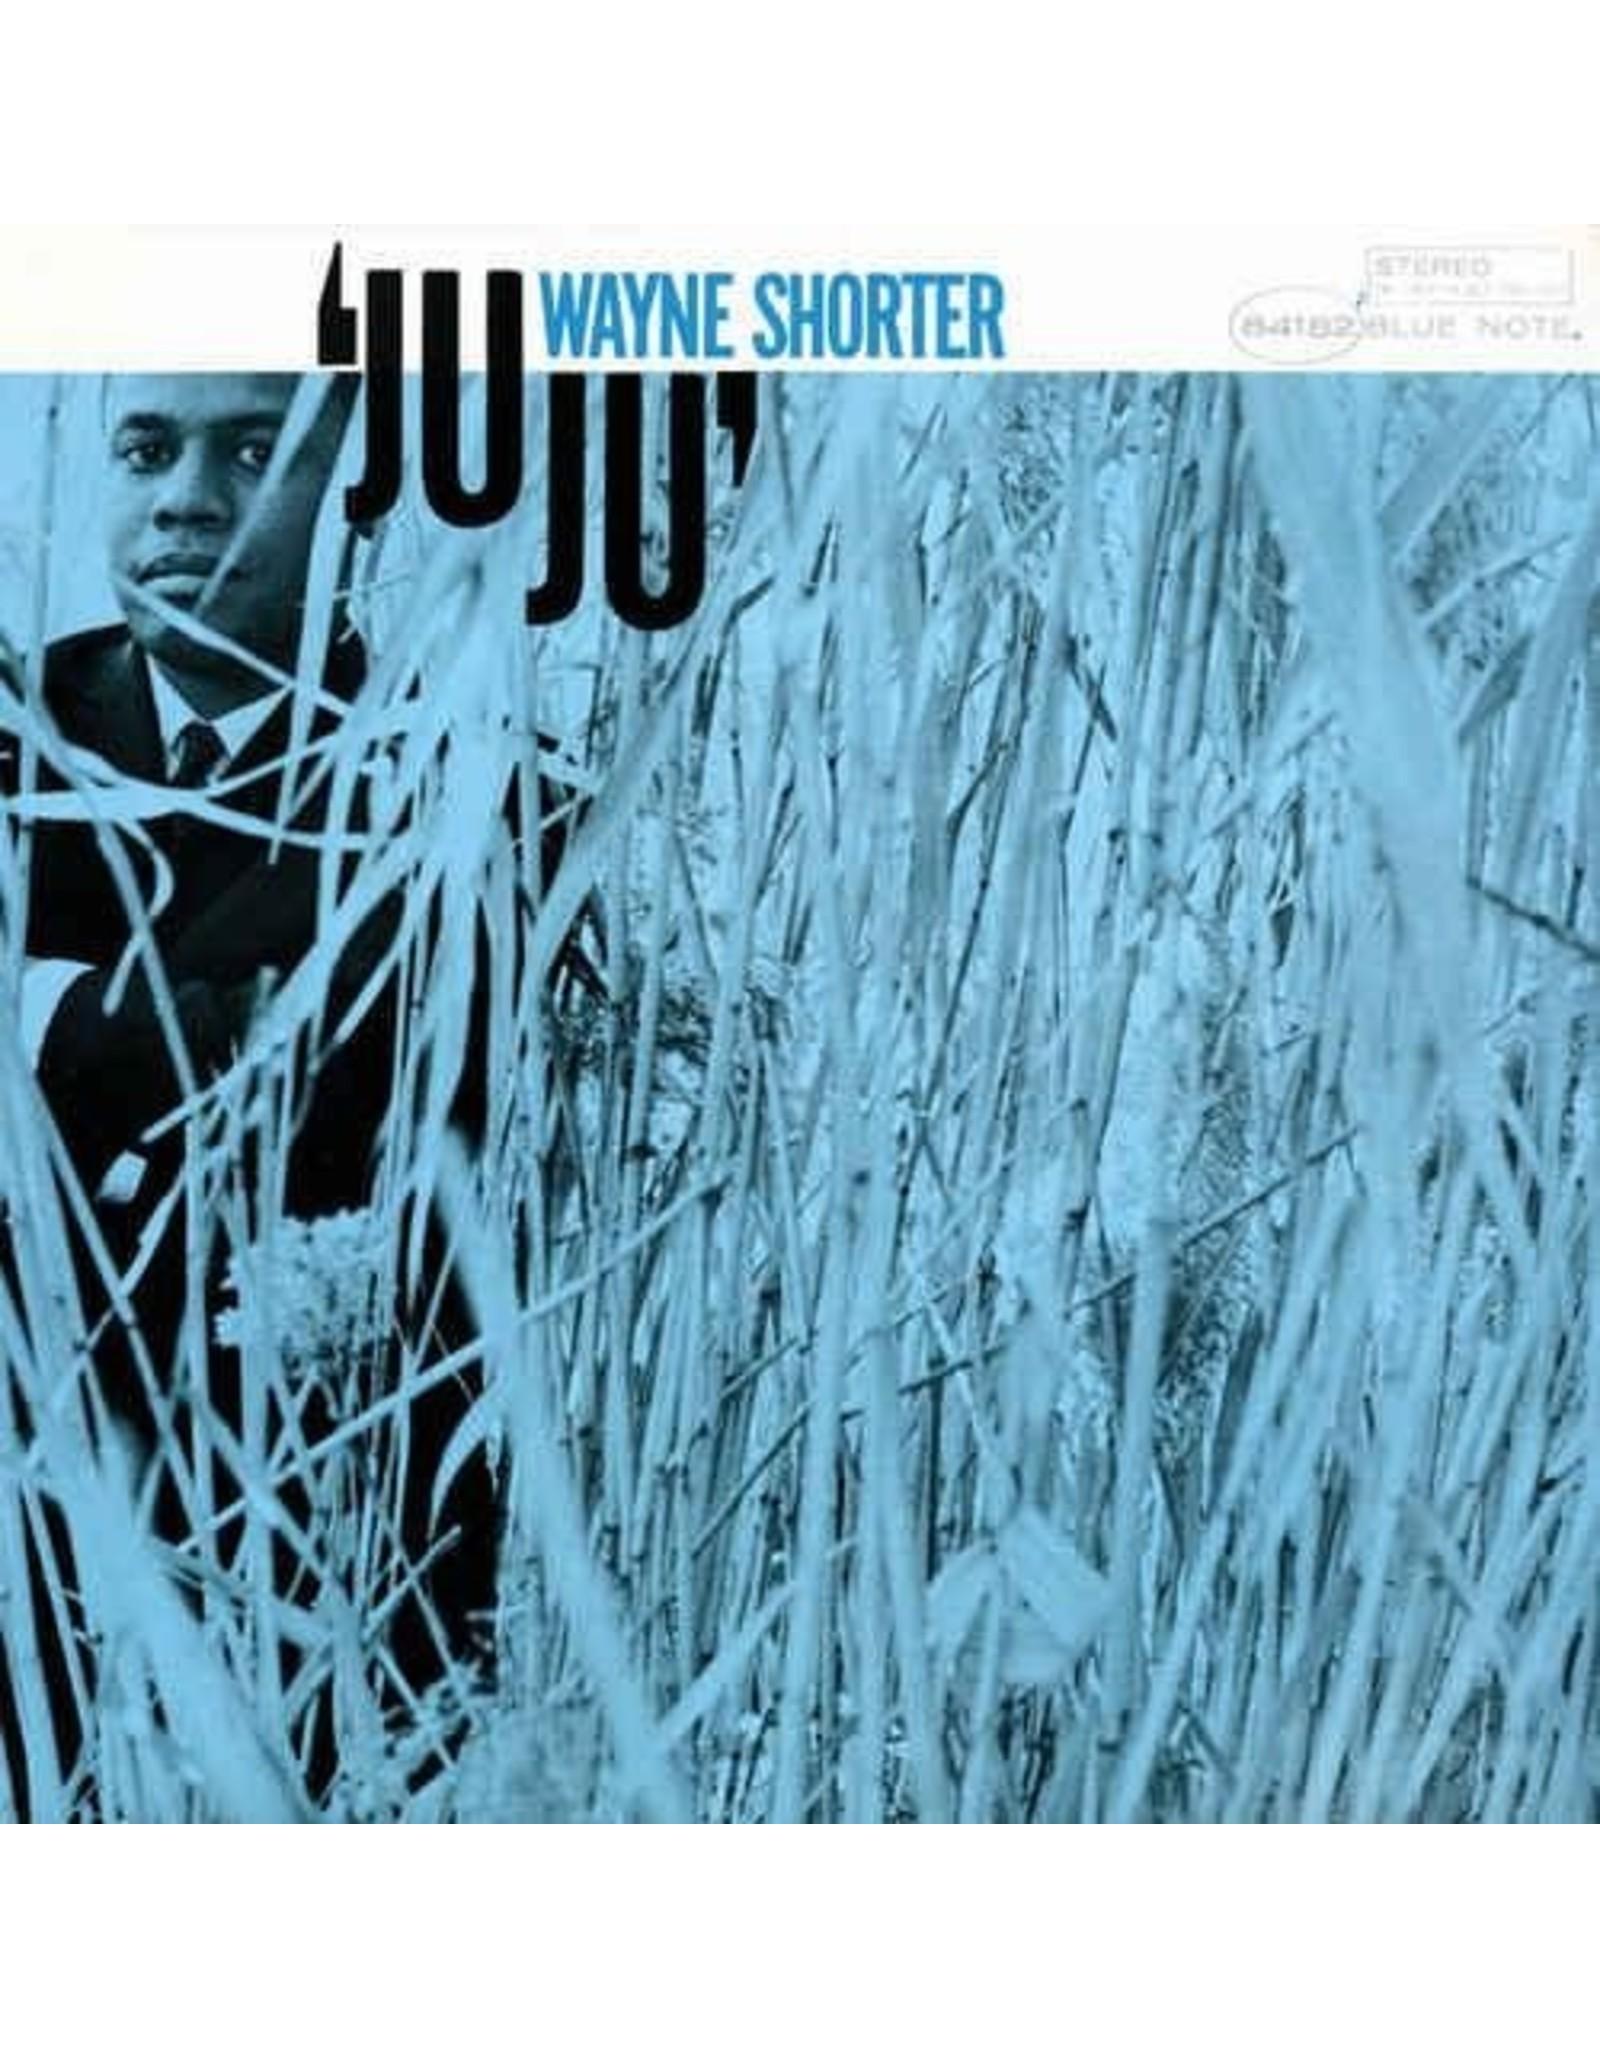 New Vinyl Wayne Shorter - Juju LP